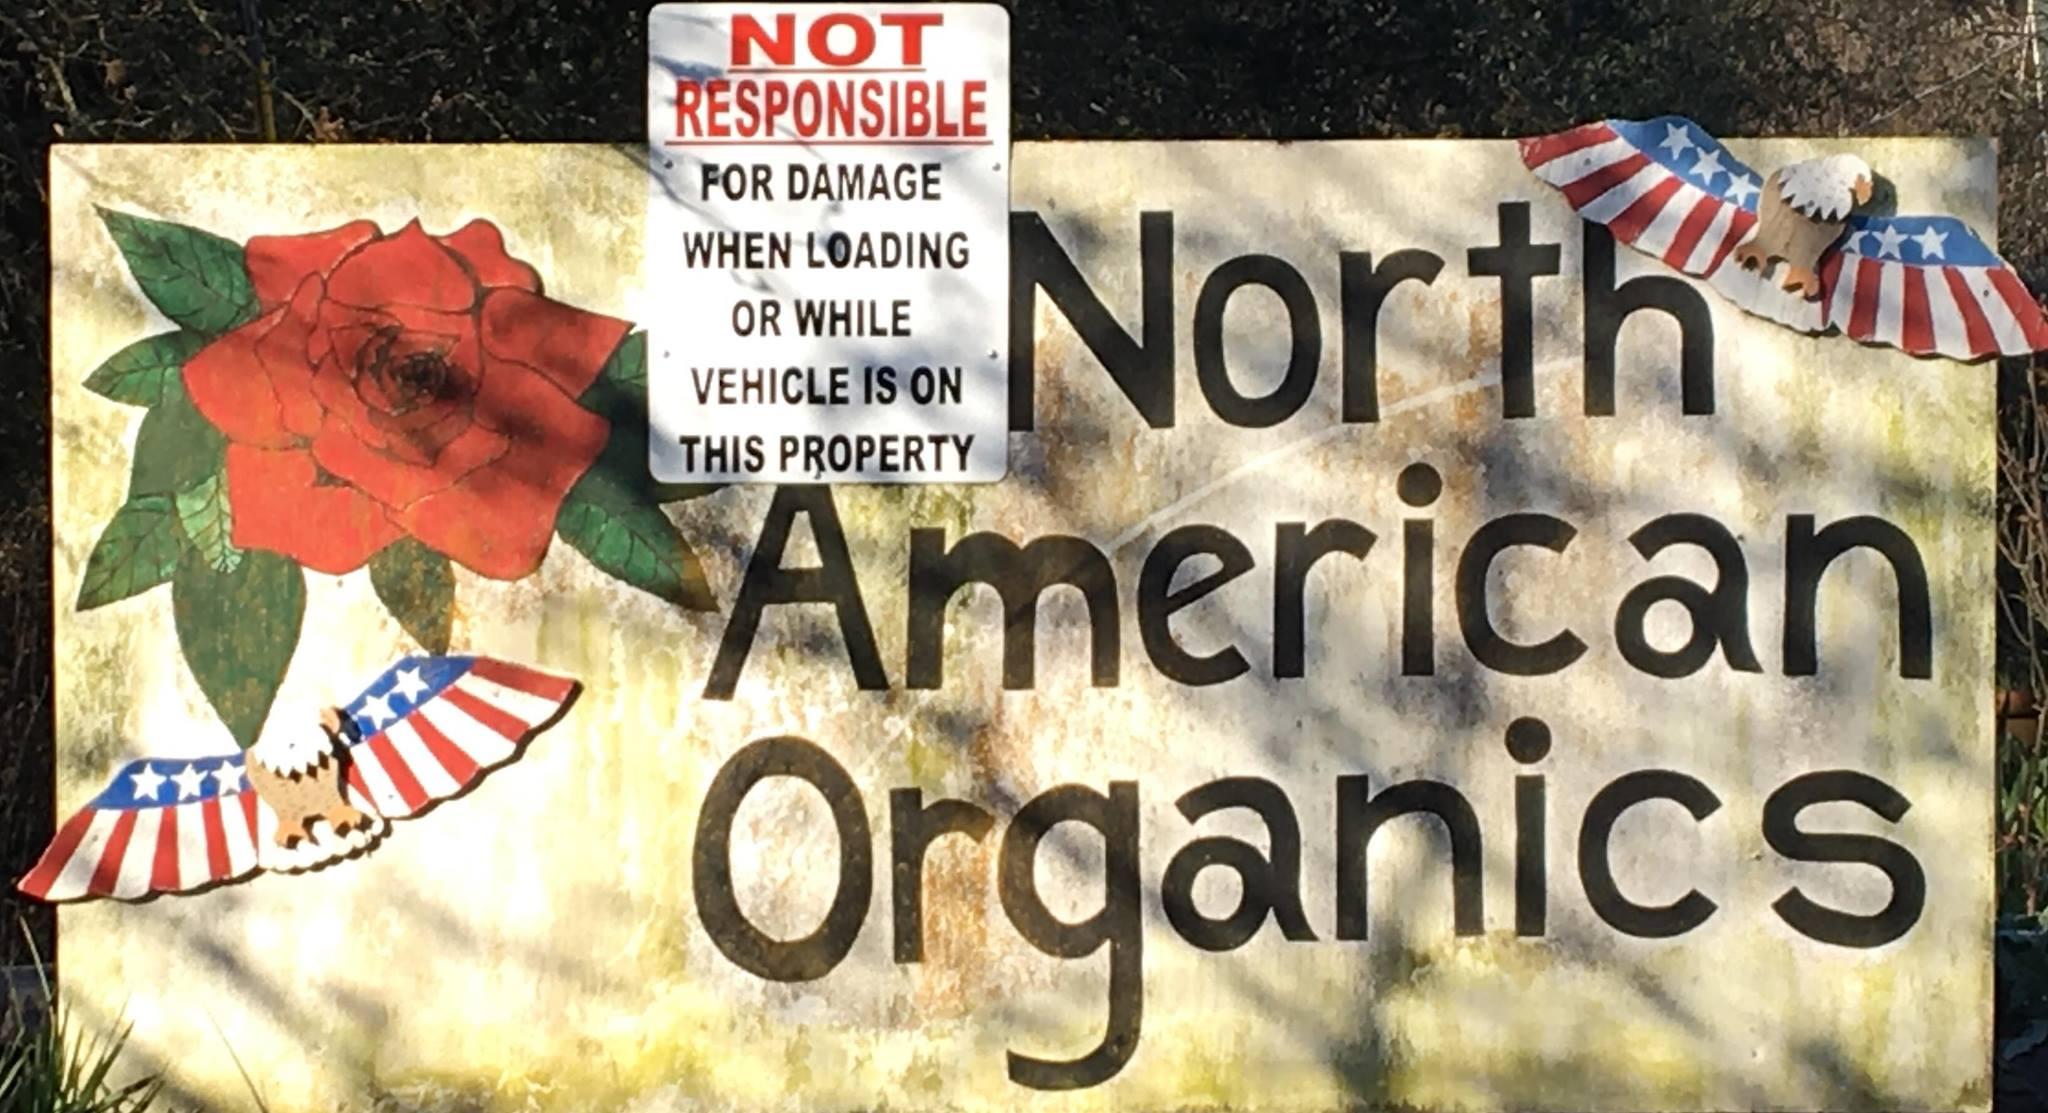 NorthAmericanOrganics